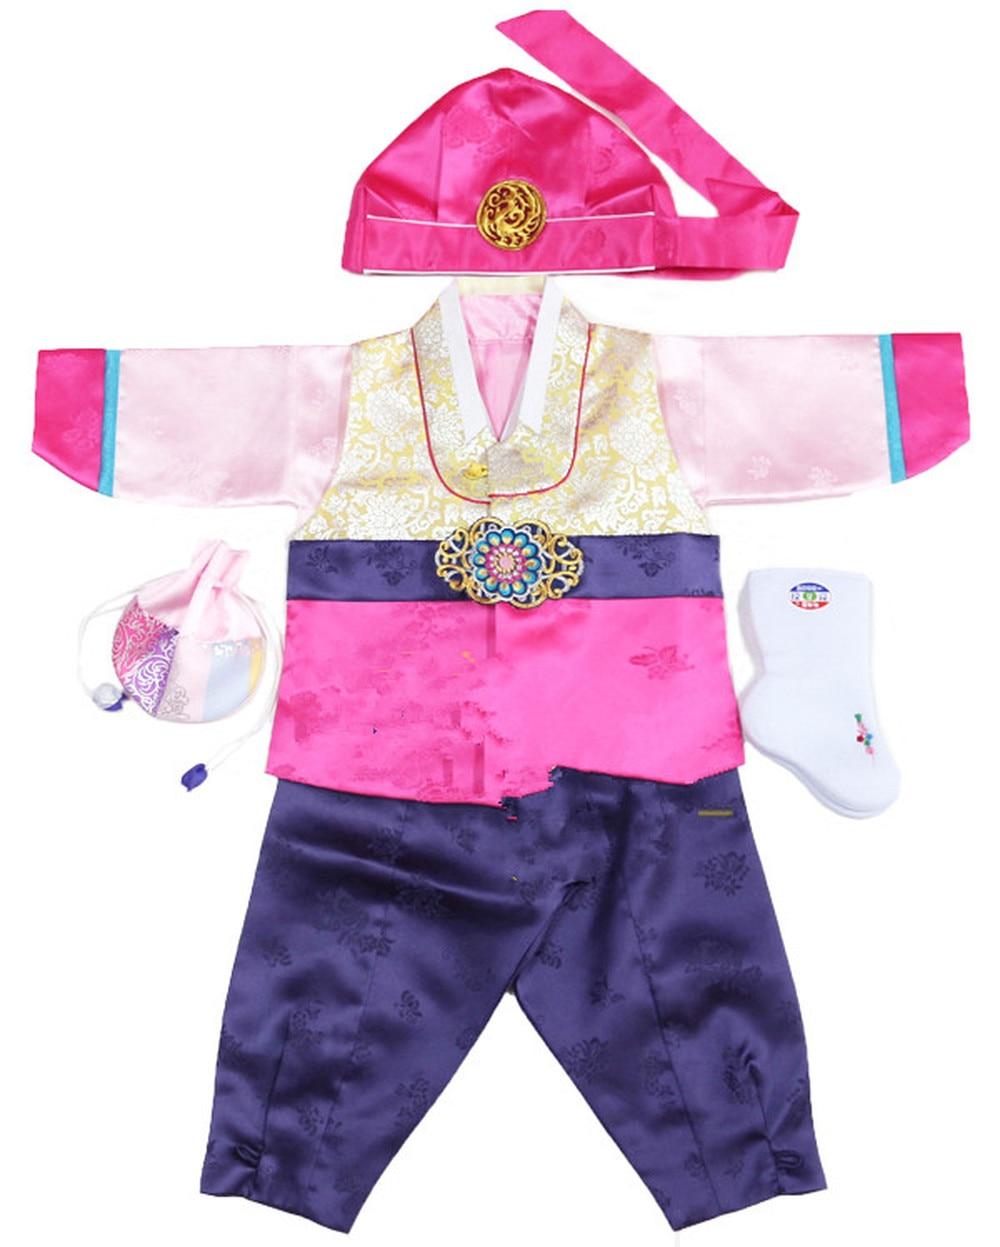 Korean Original Imported Fabric Boys Korean Suit New Korean Suit   First Birthday Korean Suit   Tracksuit Men Set Cut Fashion